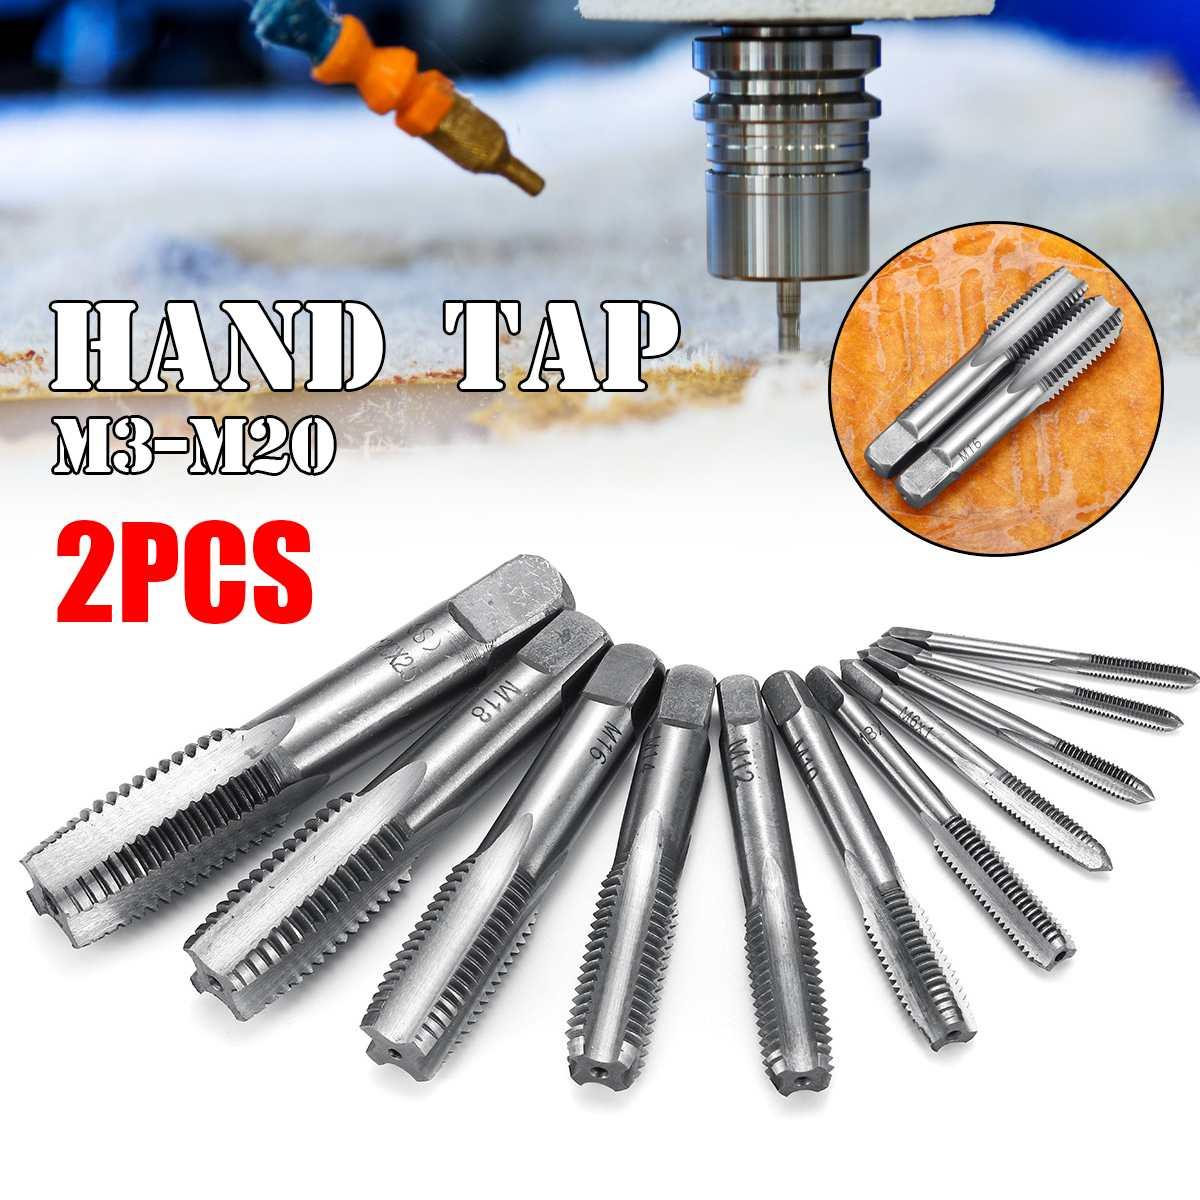 M3 M4 M5 M6 M8 M10 M12 M14 M16 M18 M20 Machine Straight Fluted Screw Thread Metric Plug Hand Tap Drill Set Hand Tools